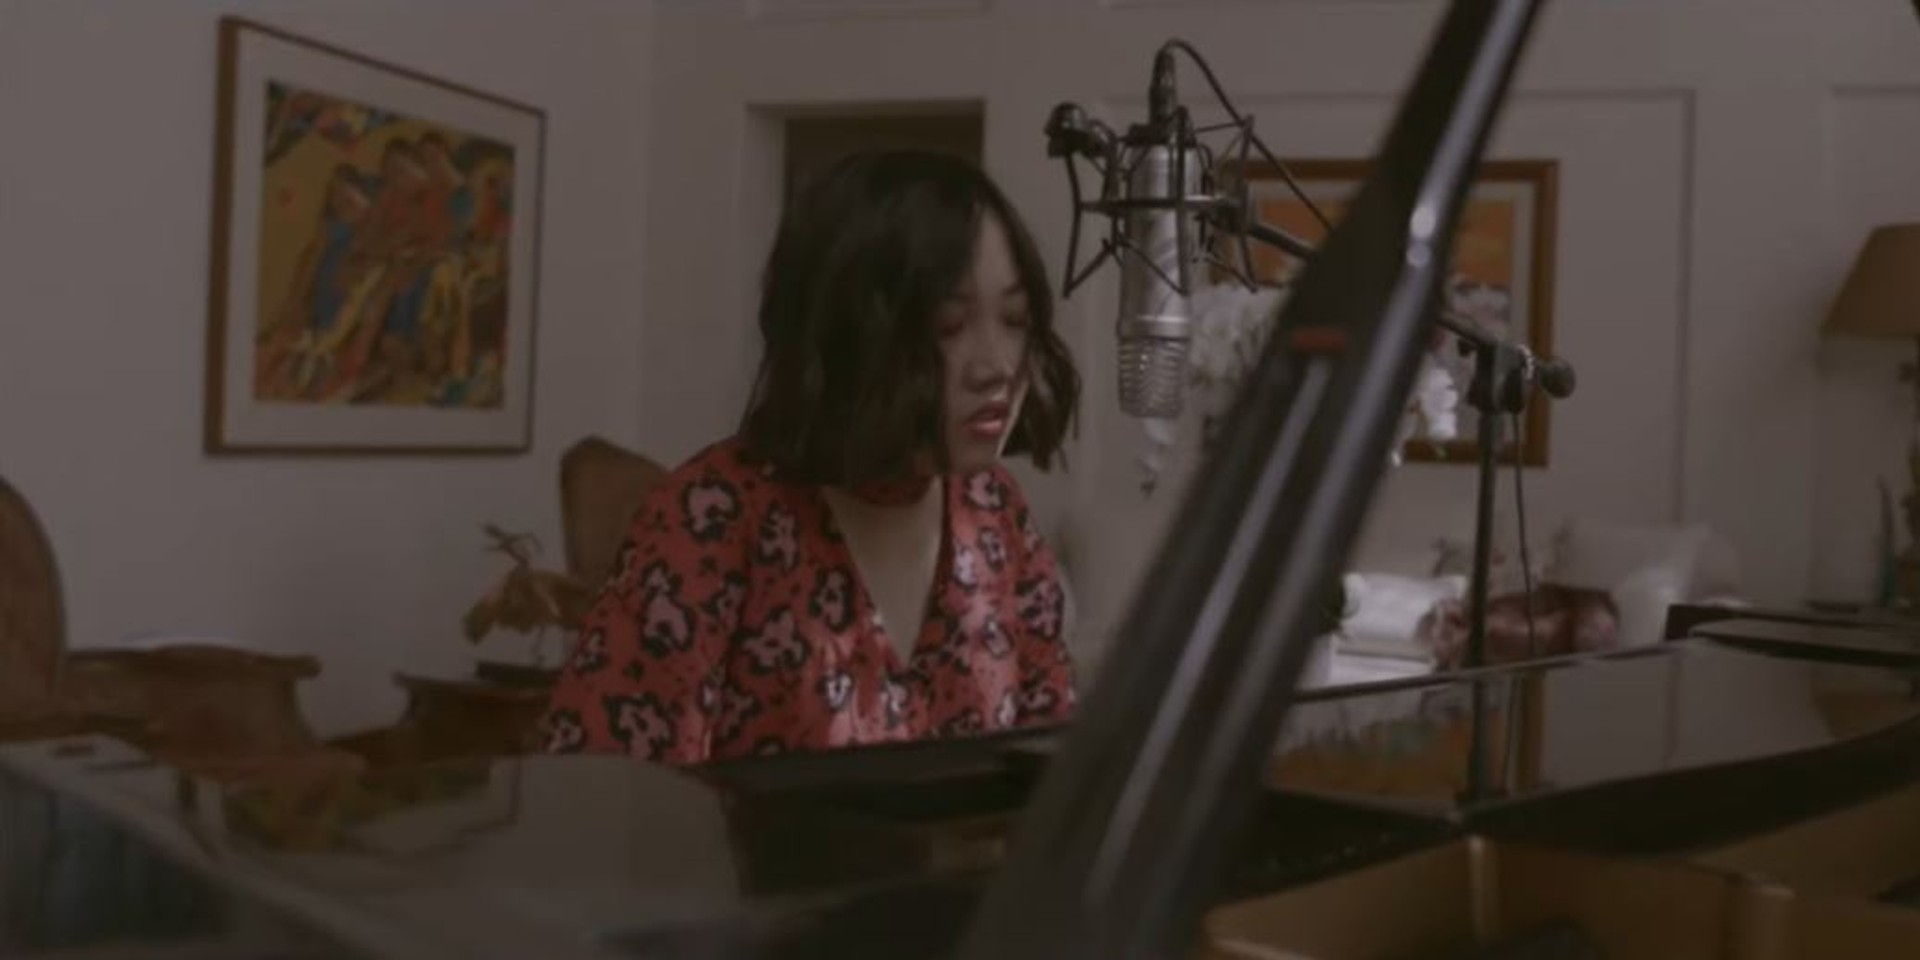 Ena Mori releases honest acoustic version of 'Break' – watch